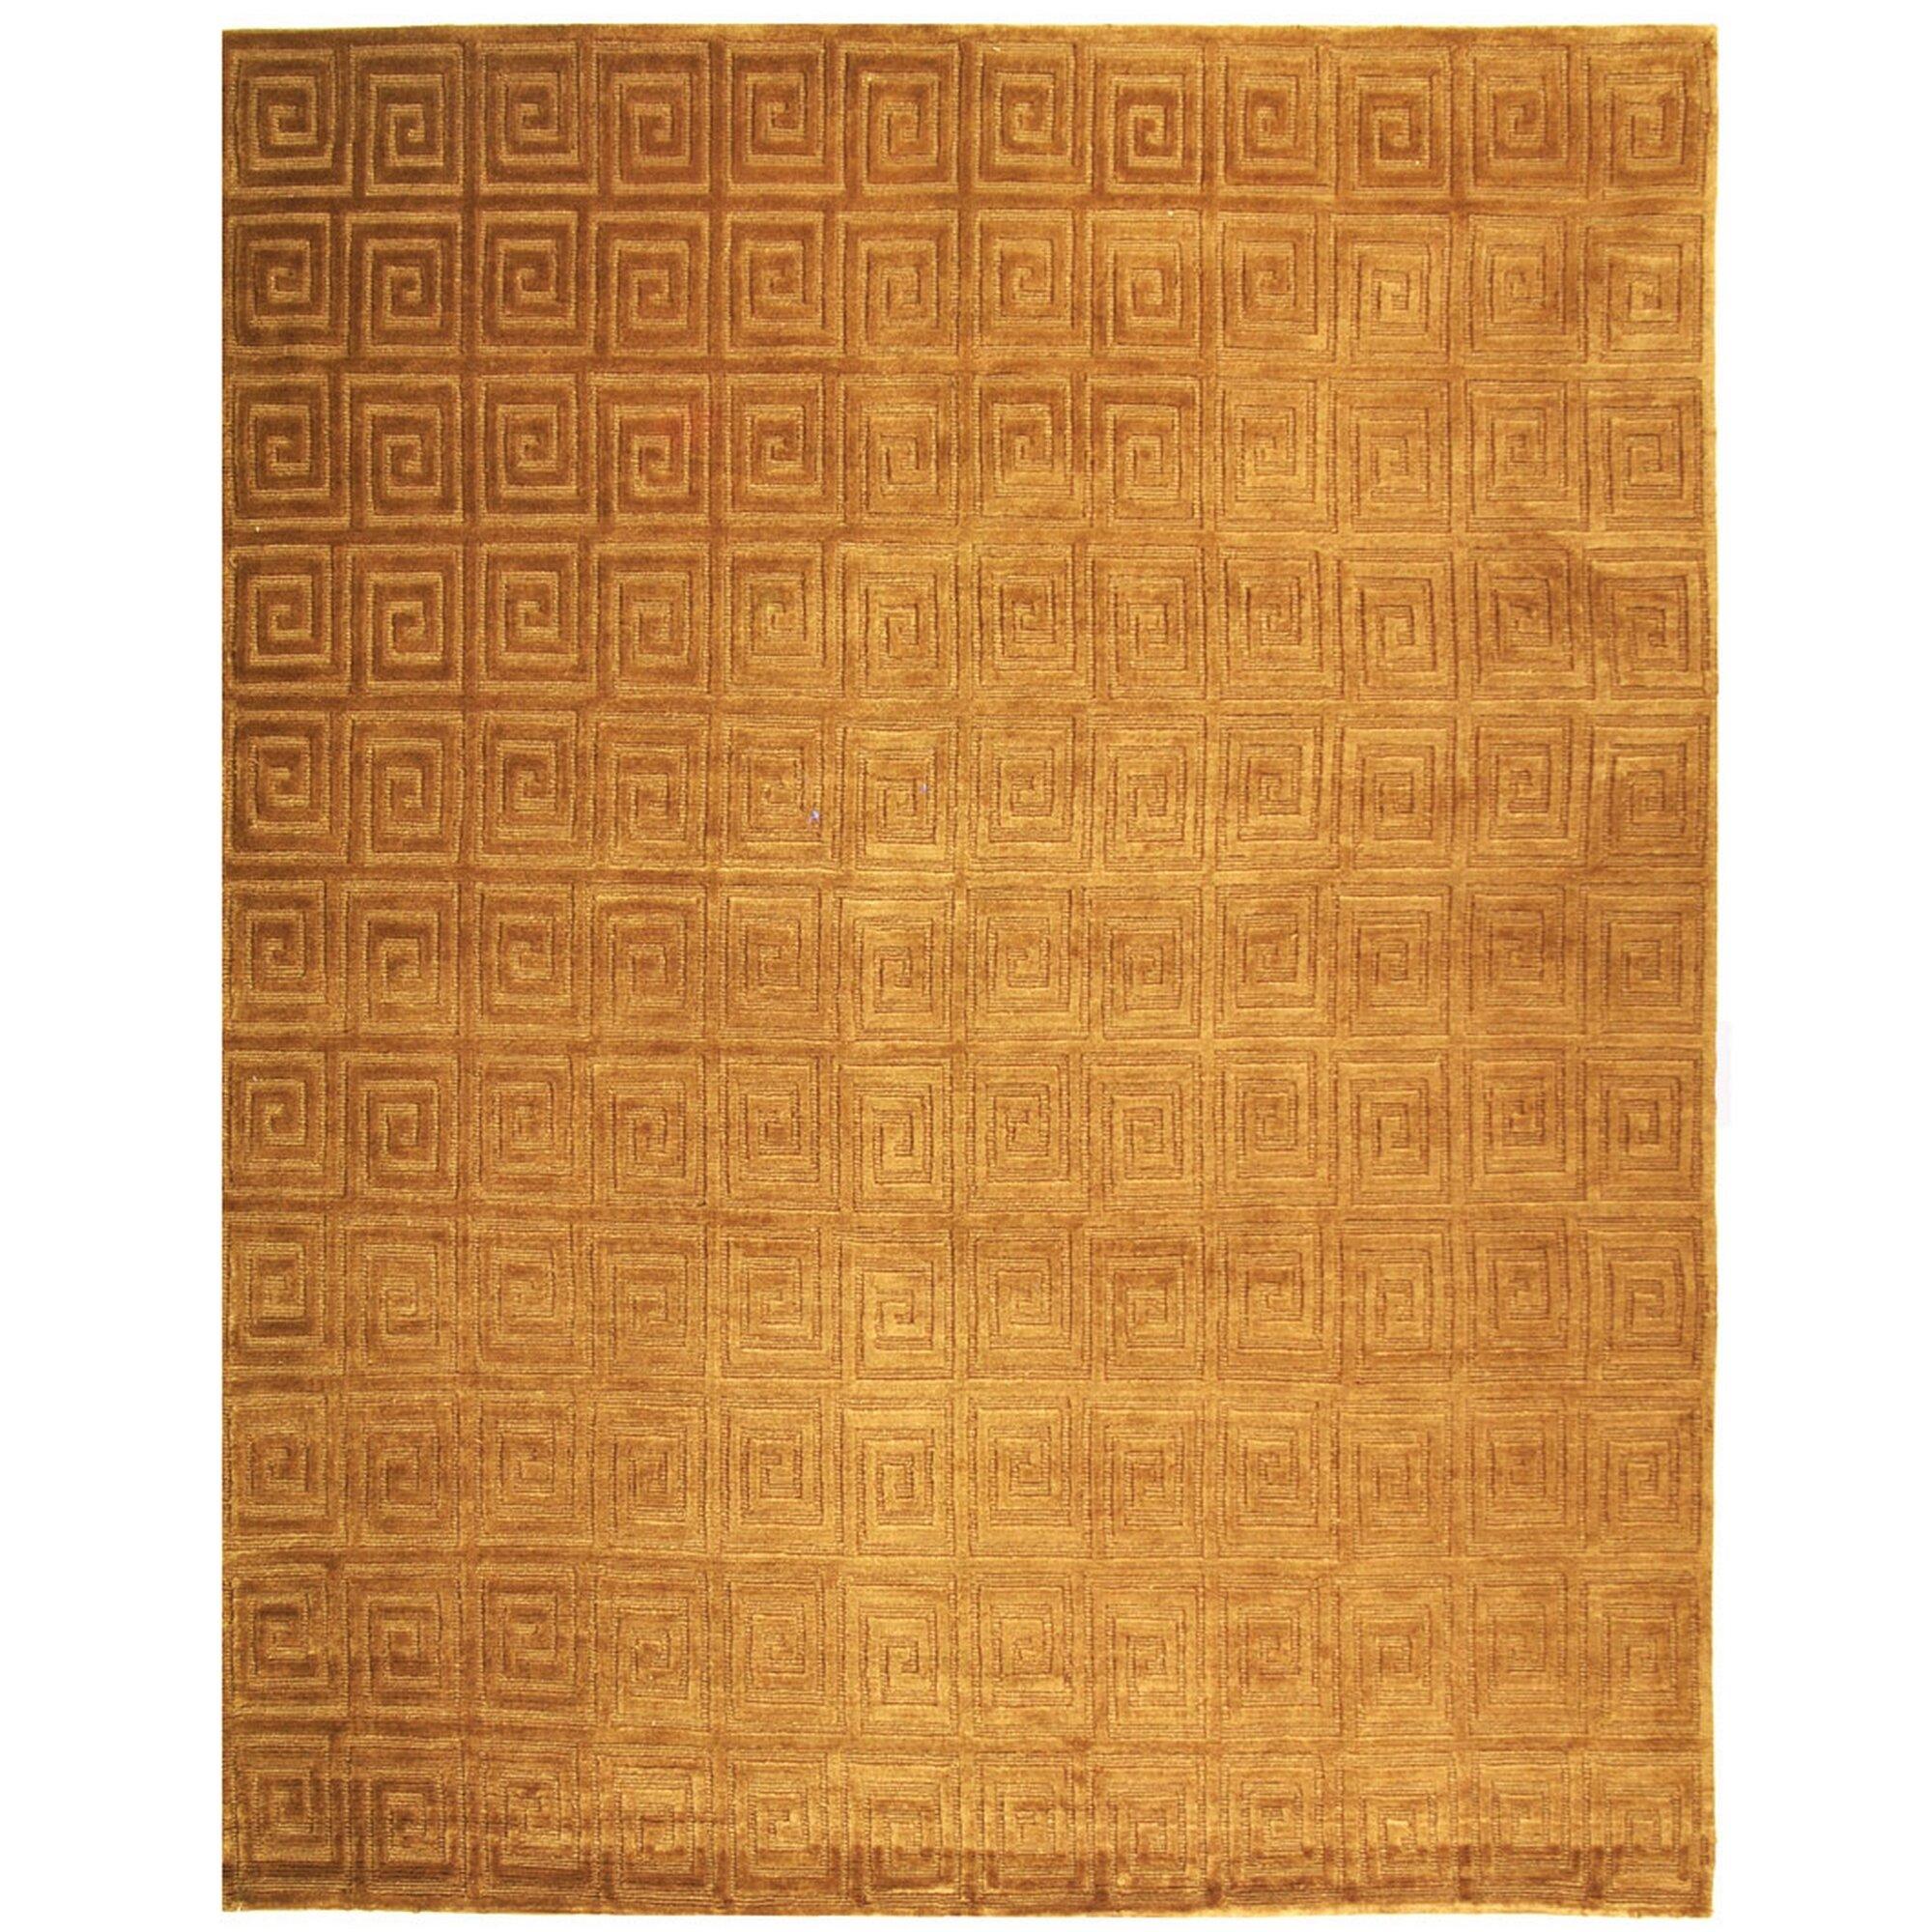 28 greek key area rug athens greek key area rugs